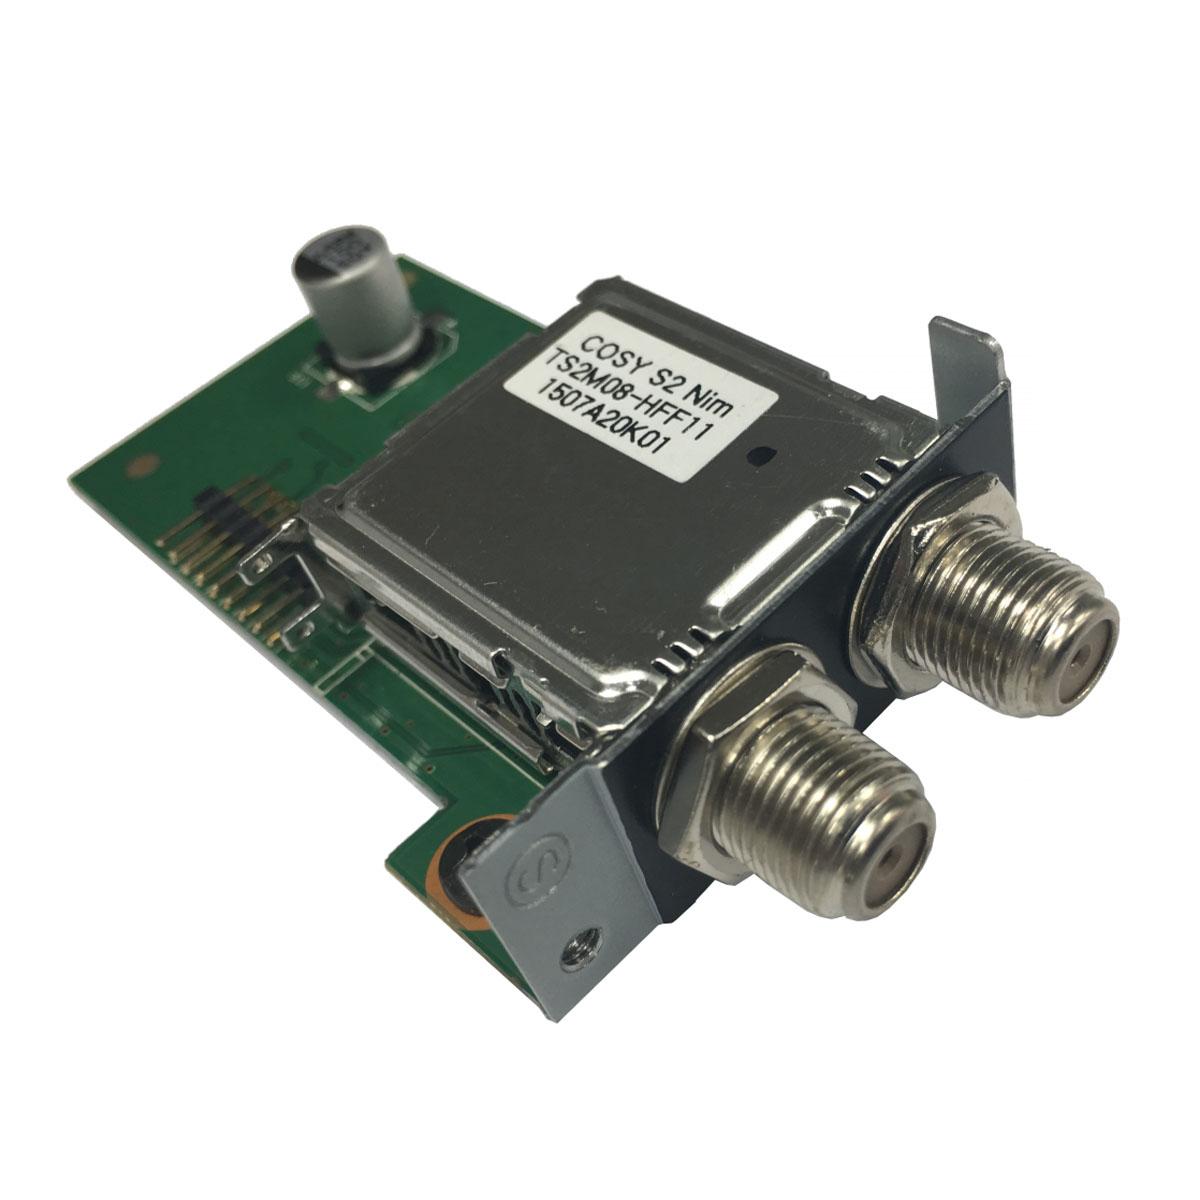 SAB Alpha Triple HD SAT Tuner DVB-S2 Satelliten Tuner